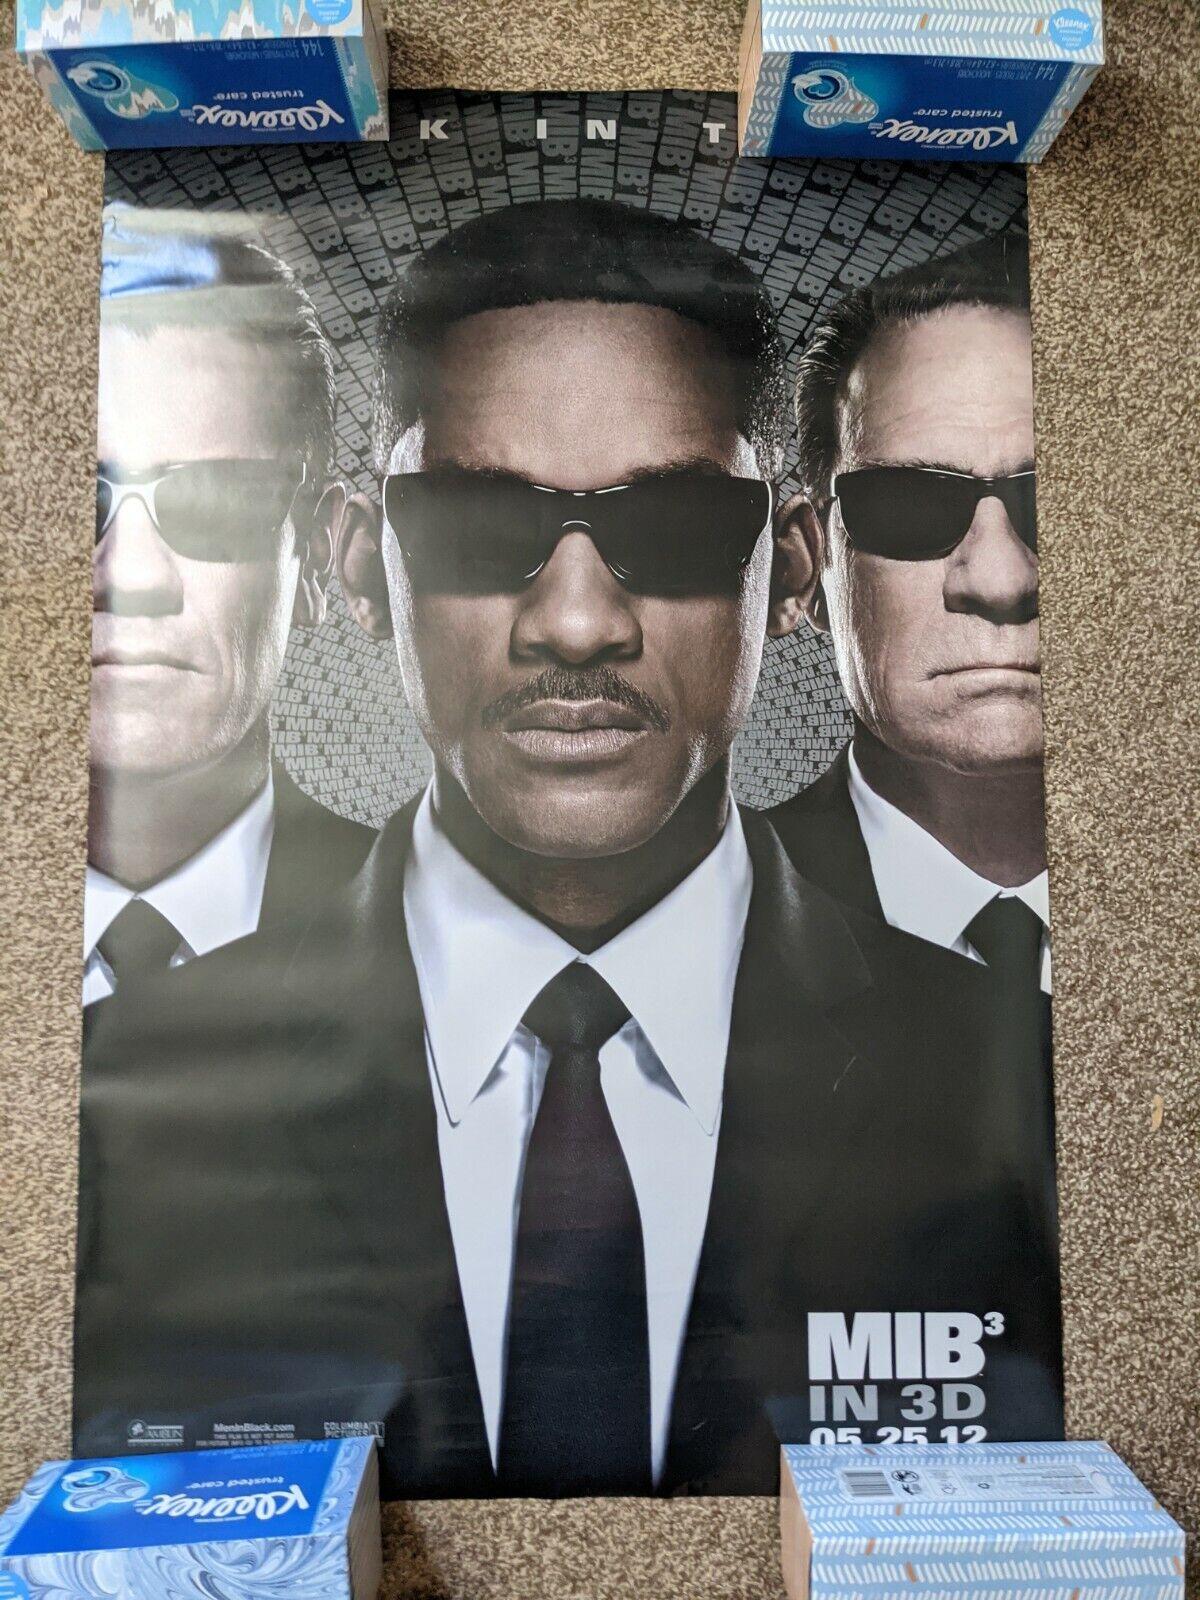 Men In Black 3 Original Movie Poster Featuring Will Smith Tommy Lee Jones MIB3 - $0.99